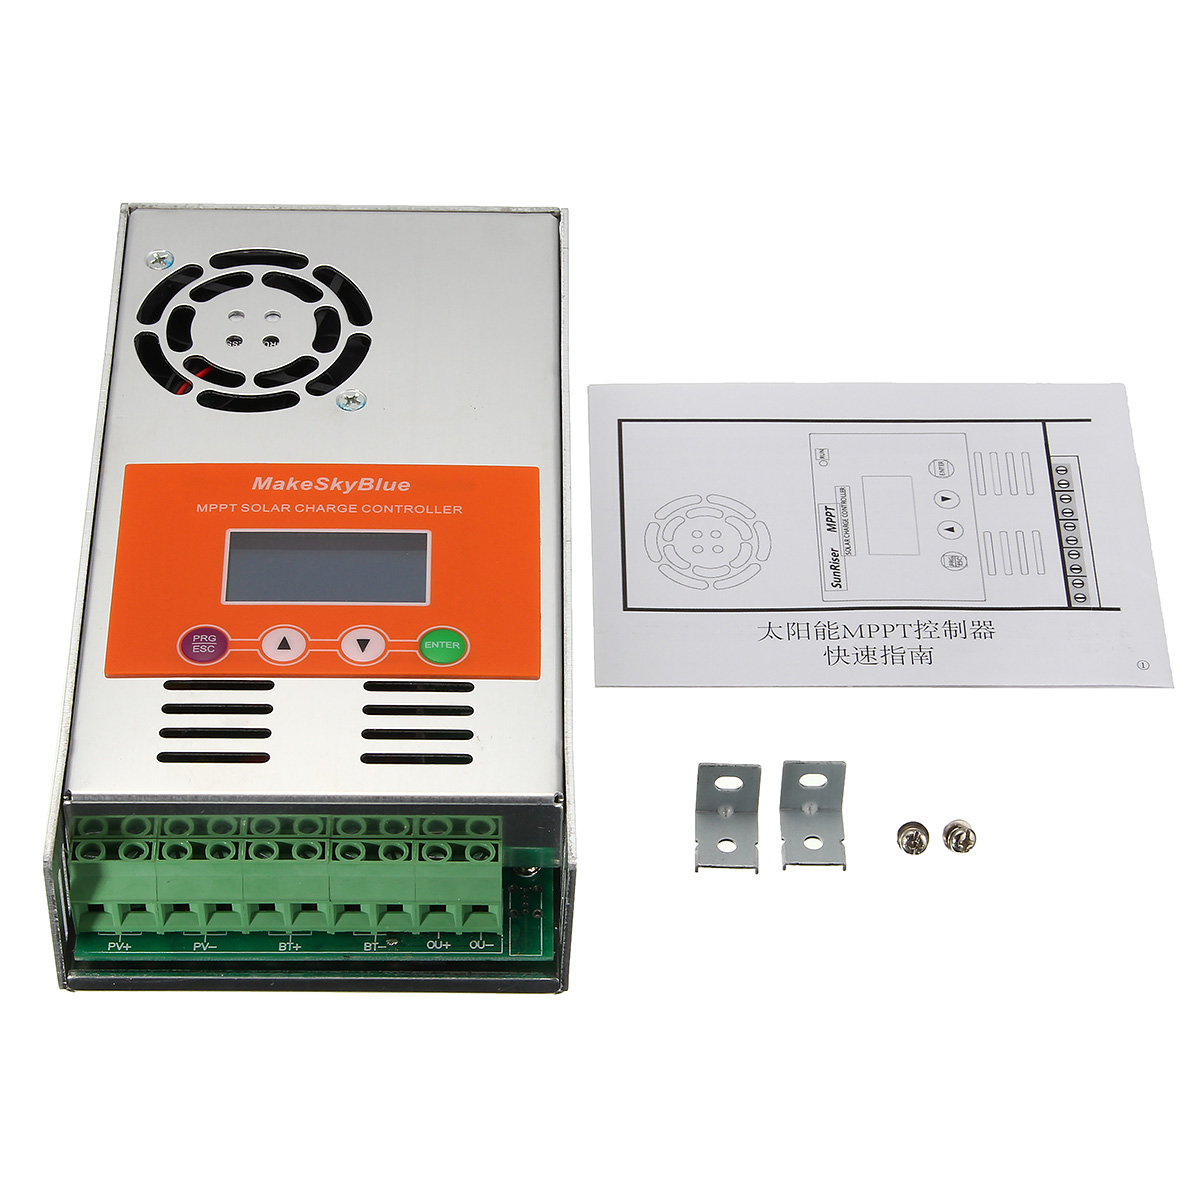 LCD 50A MPPT Solar Charge Controller Regulator for 12V/24V/36V/48VDC System Solar Panel Battery Regulator Controller